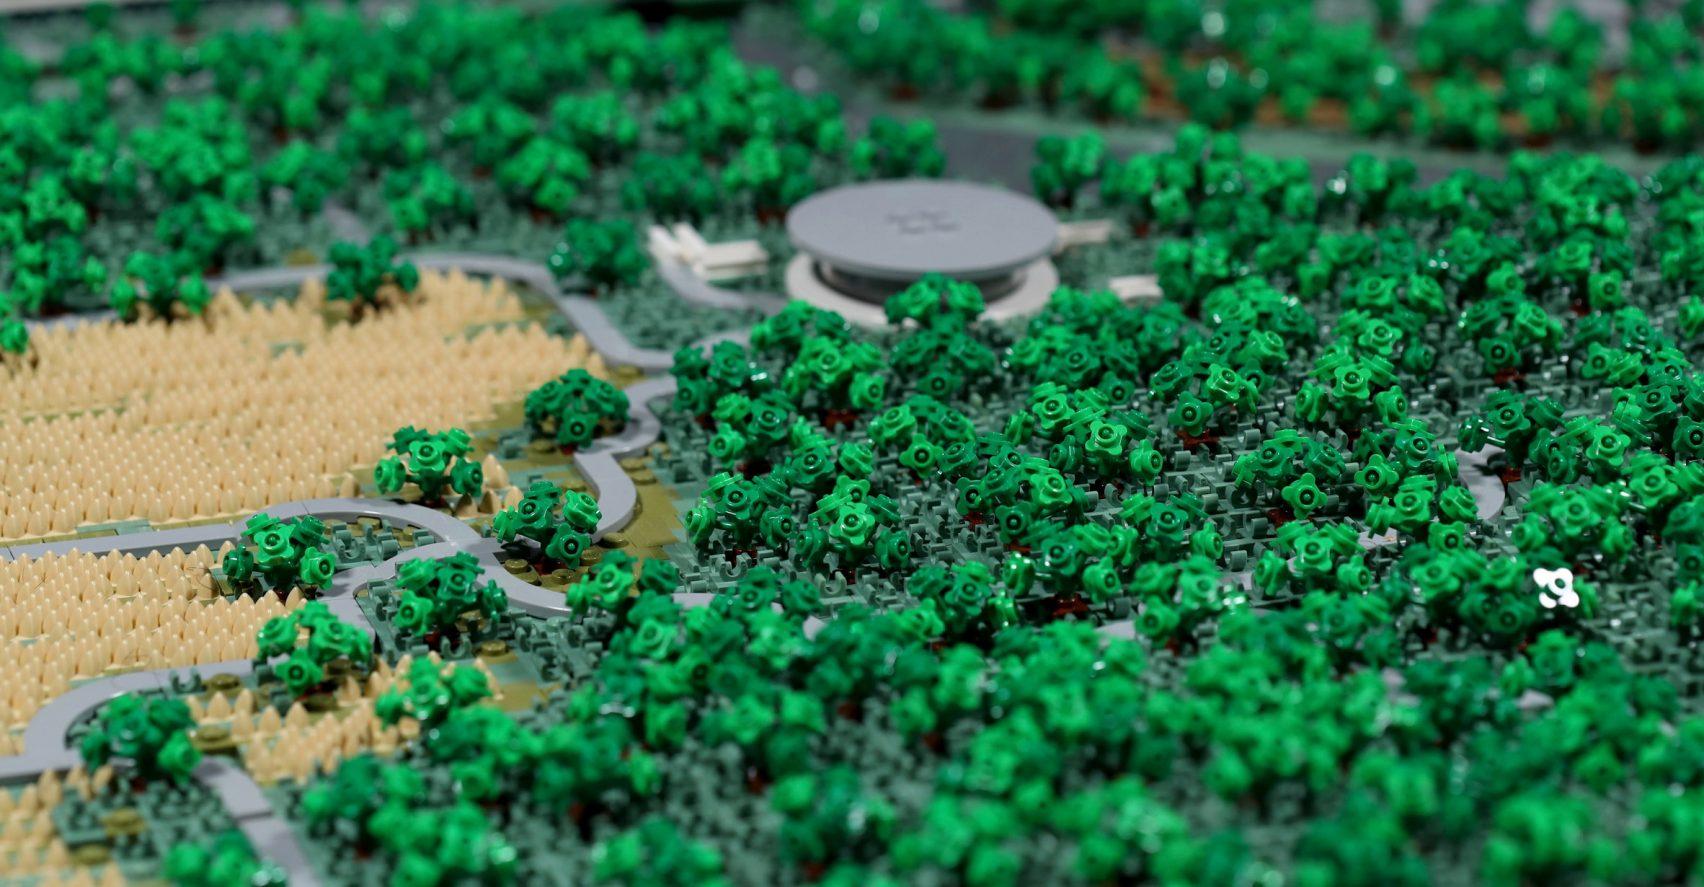 apple-park-cupertino-lego-spencer-rezkalla-foster-partners-_dezeen_2364_col_25-1704×887